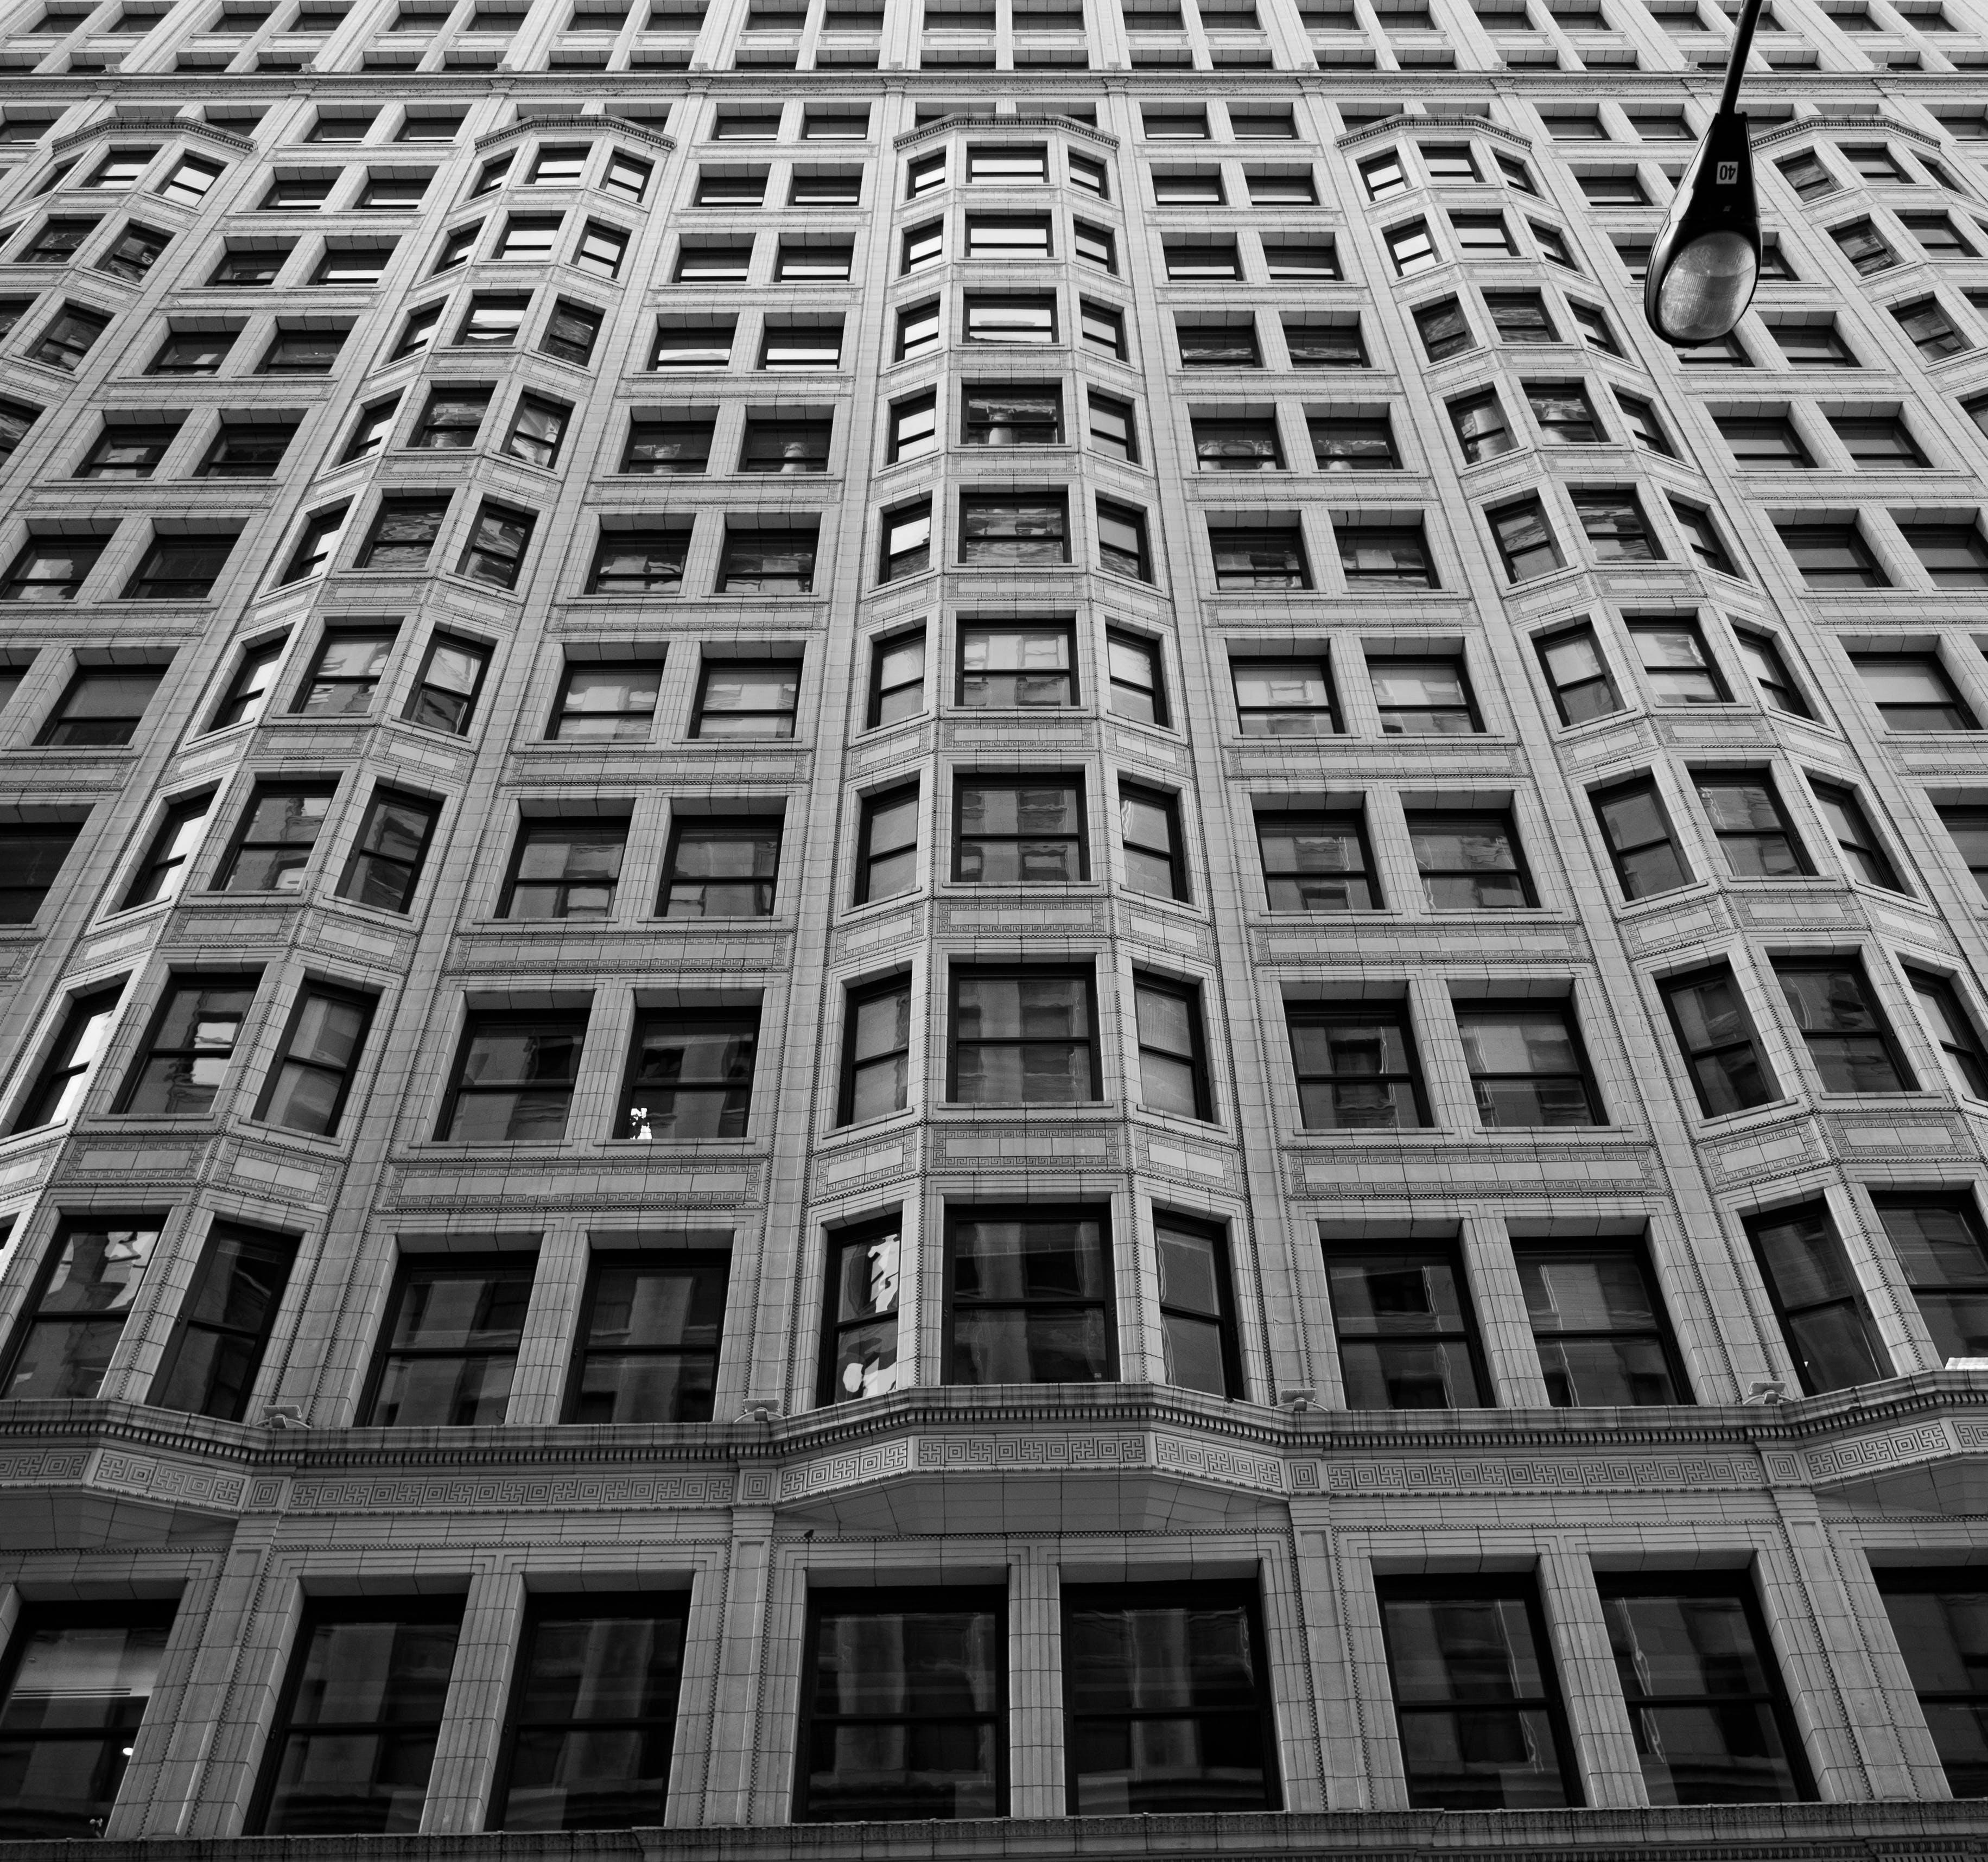 Free stock photo of building, windows, brick, black and white